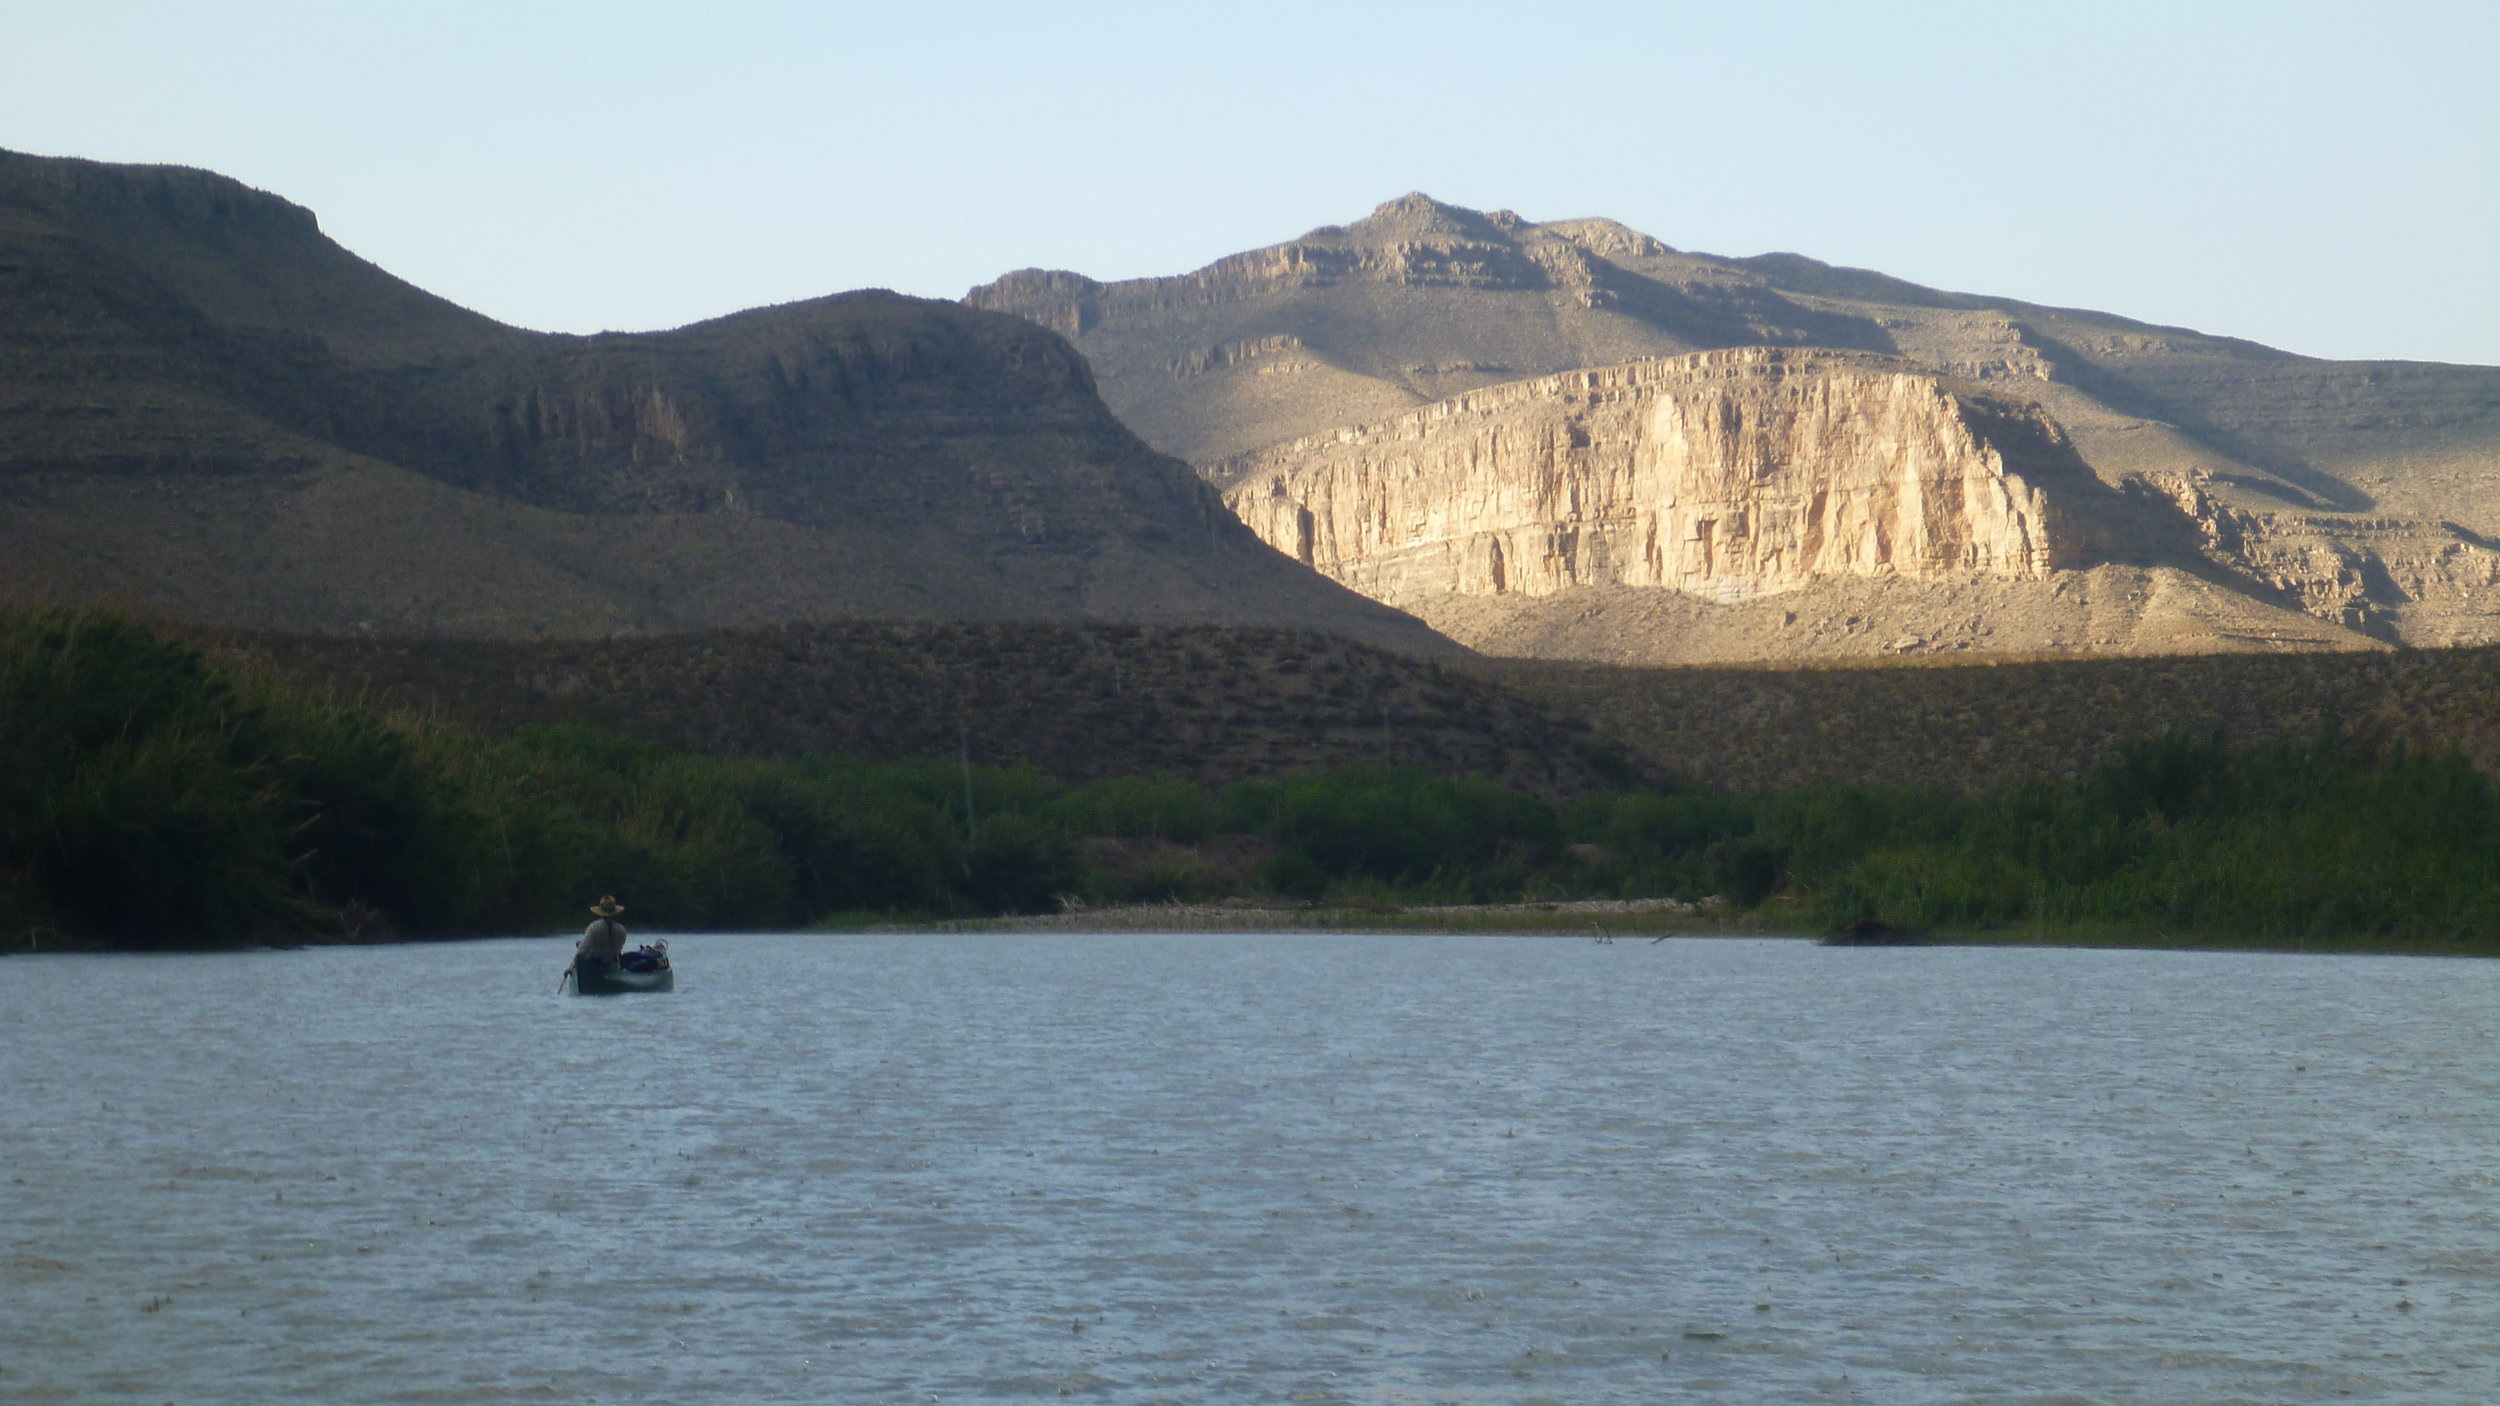 April+2012+Lower+Canyons+Seepage+Run+033.jpg